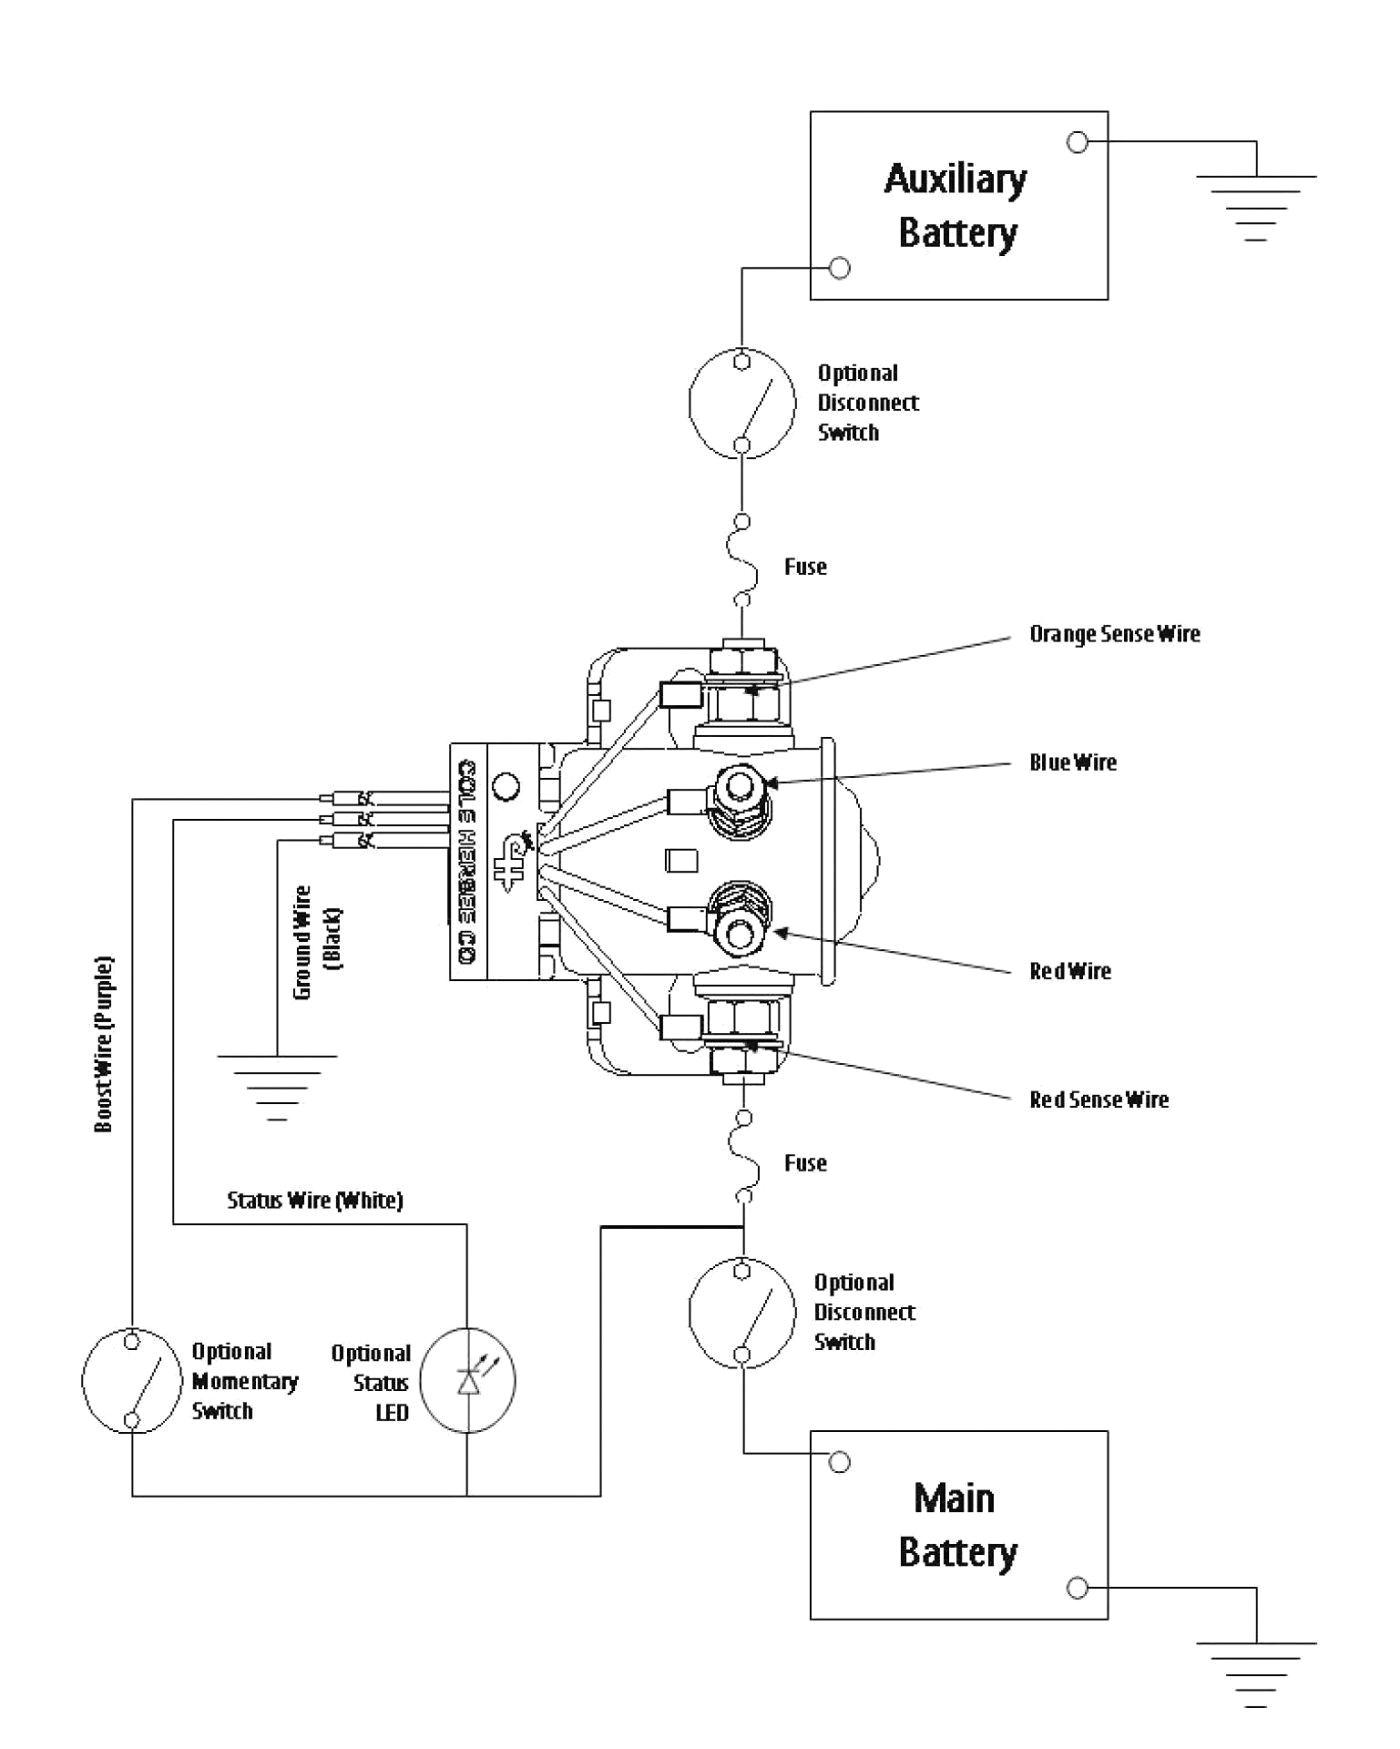 wiring water diagram heater rheemre13 wiring diagram option wiring water diagram heater rheemre13